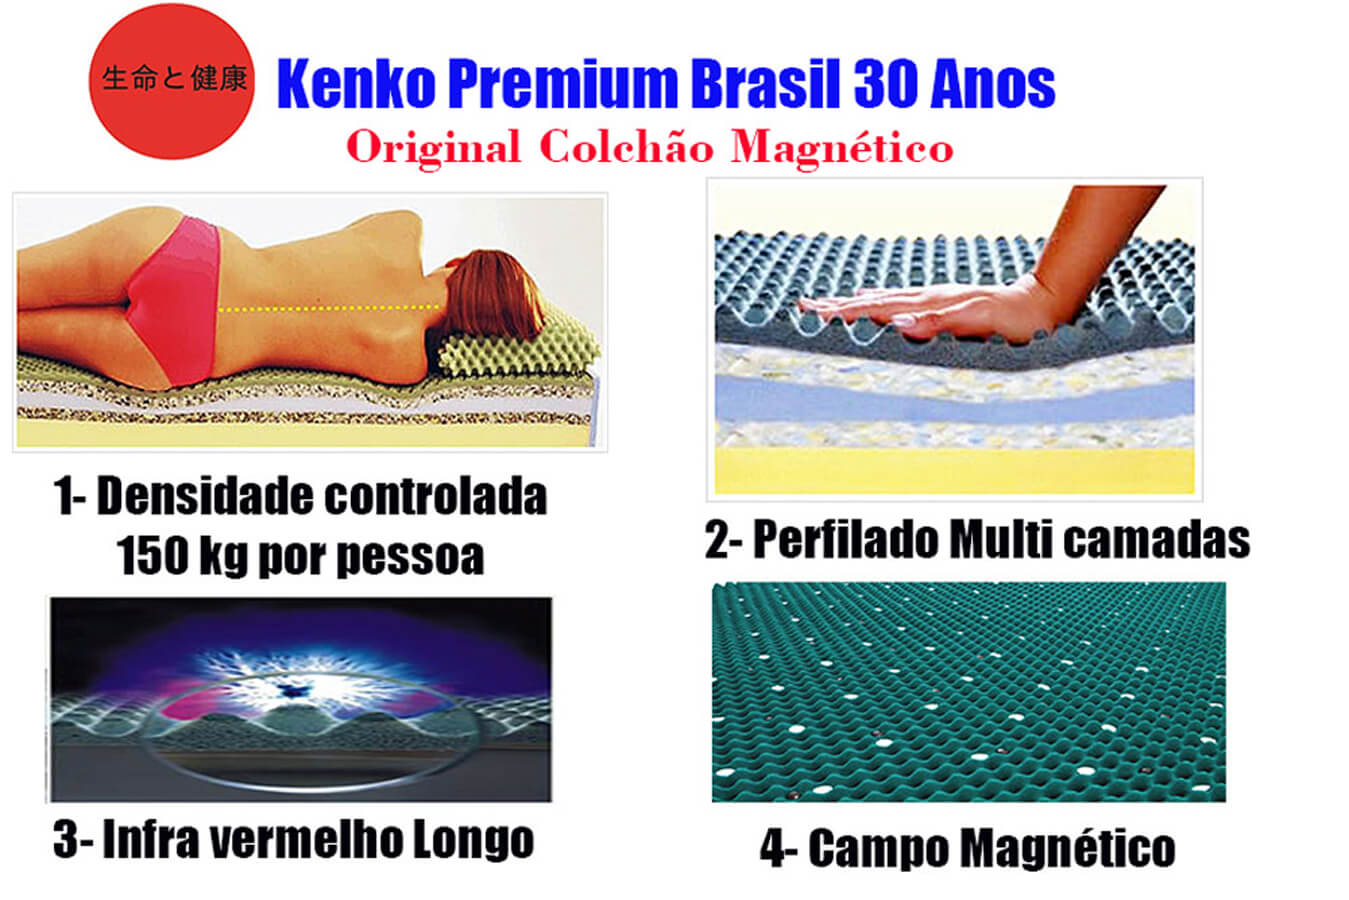 Colchão Magnético Solteiro 0,88x1,88x27cm  Kenko Premium Plus   - Kenko Premium Colchões